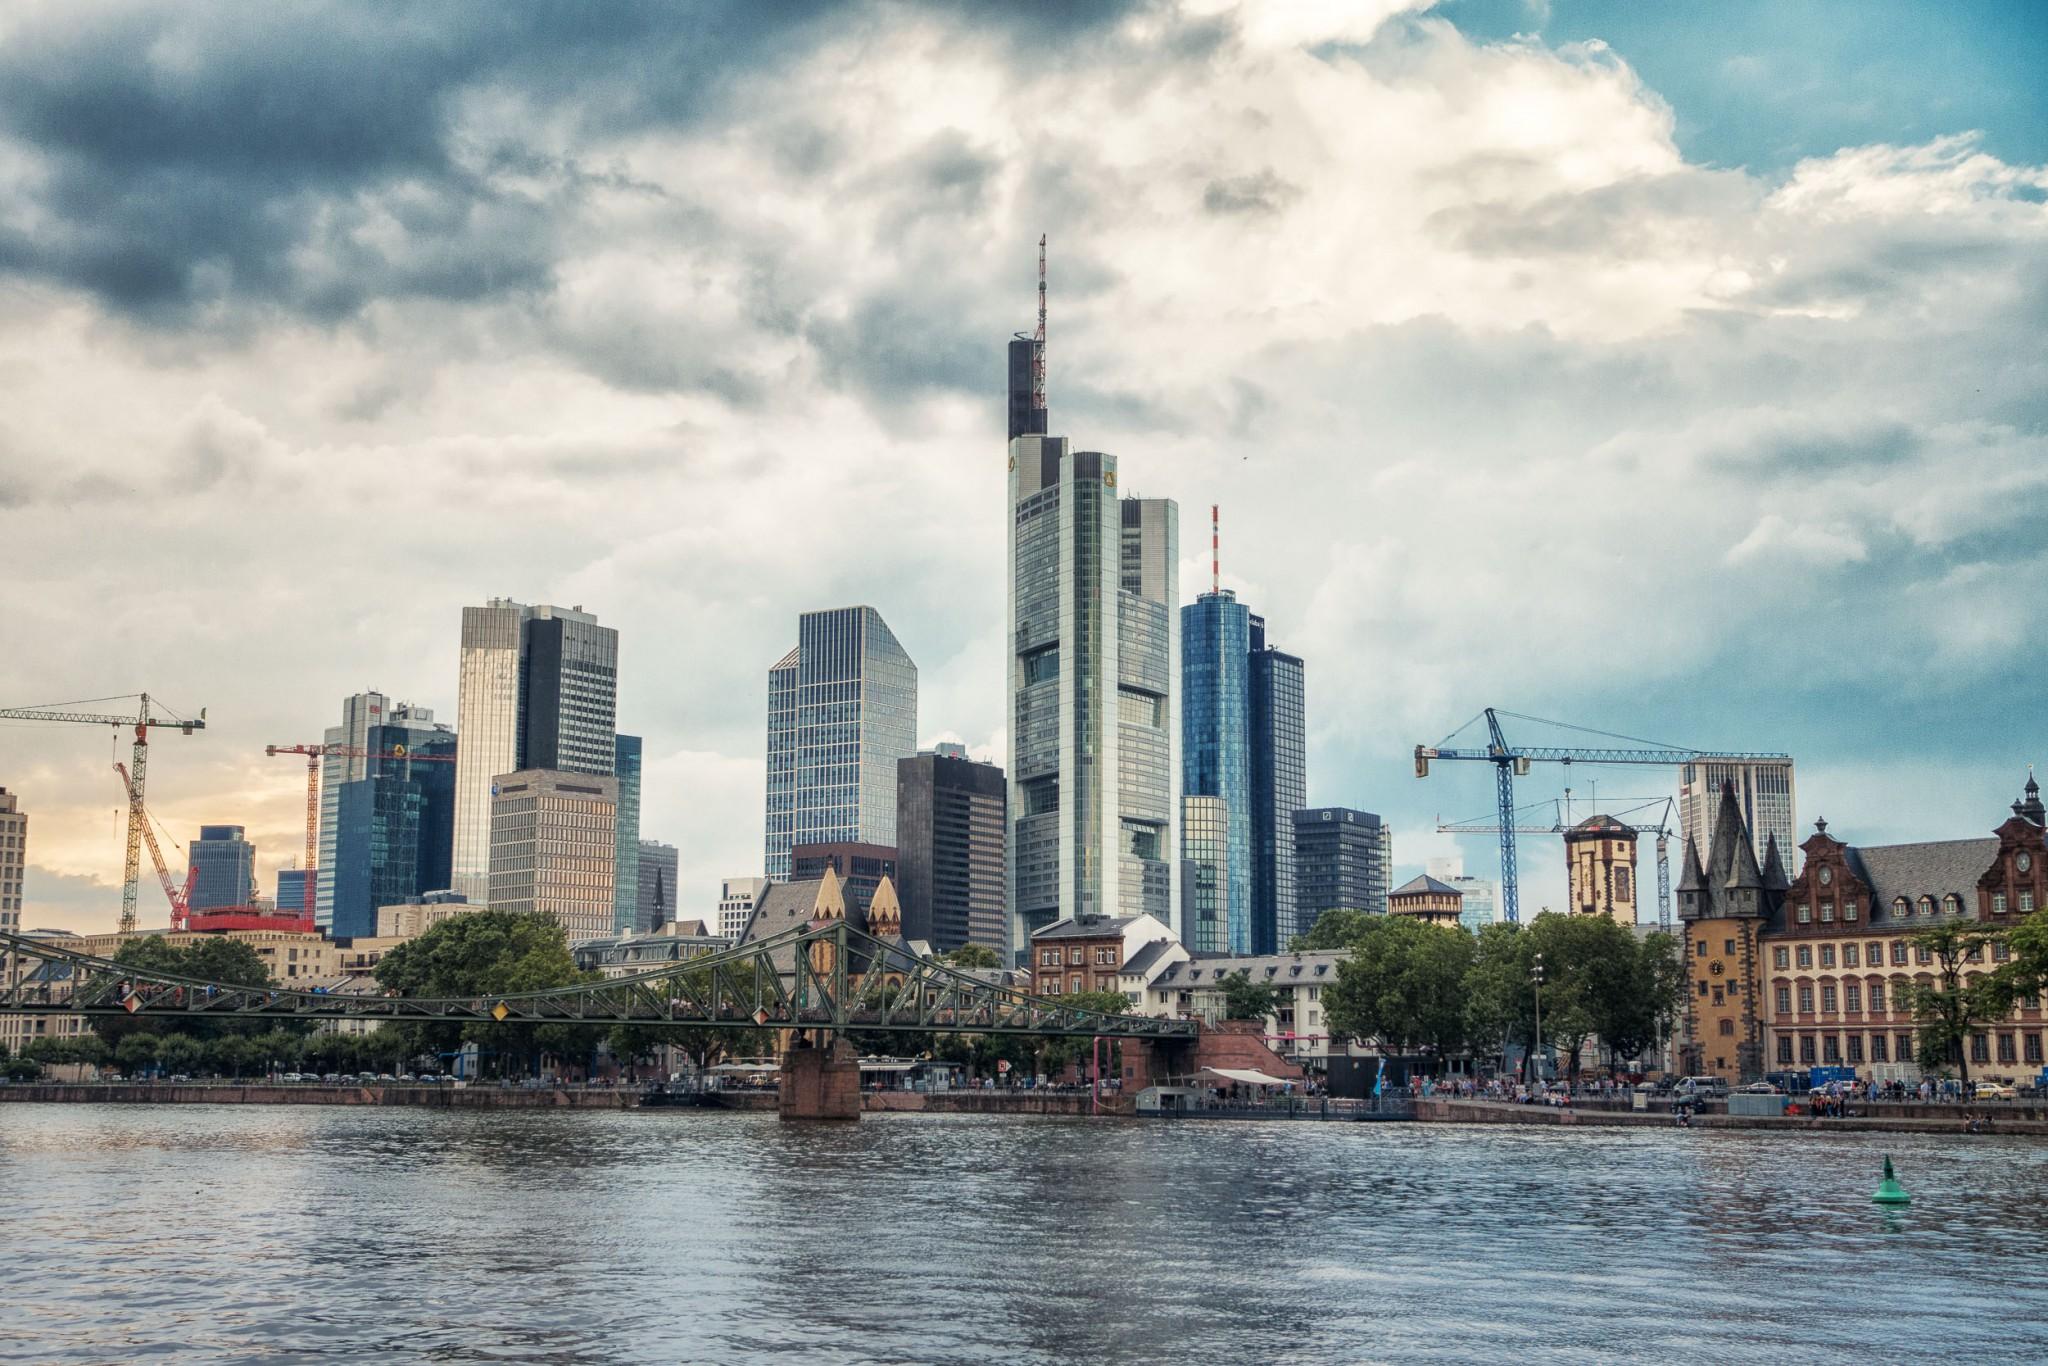 Skyline - Frankfurt am Main